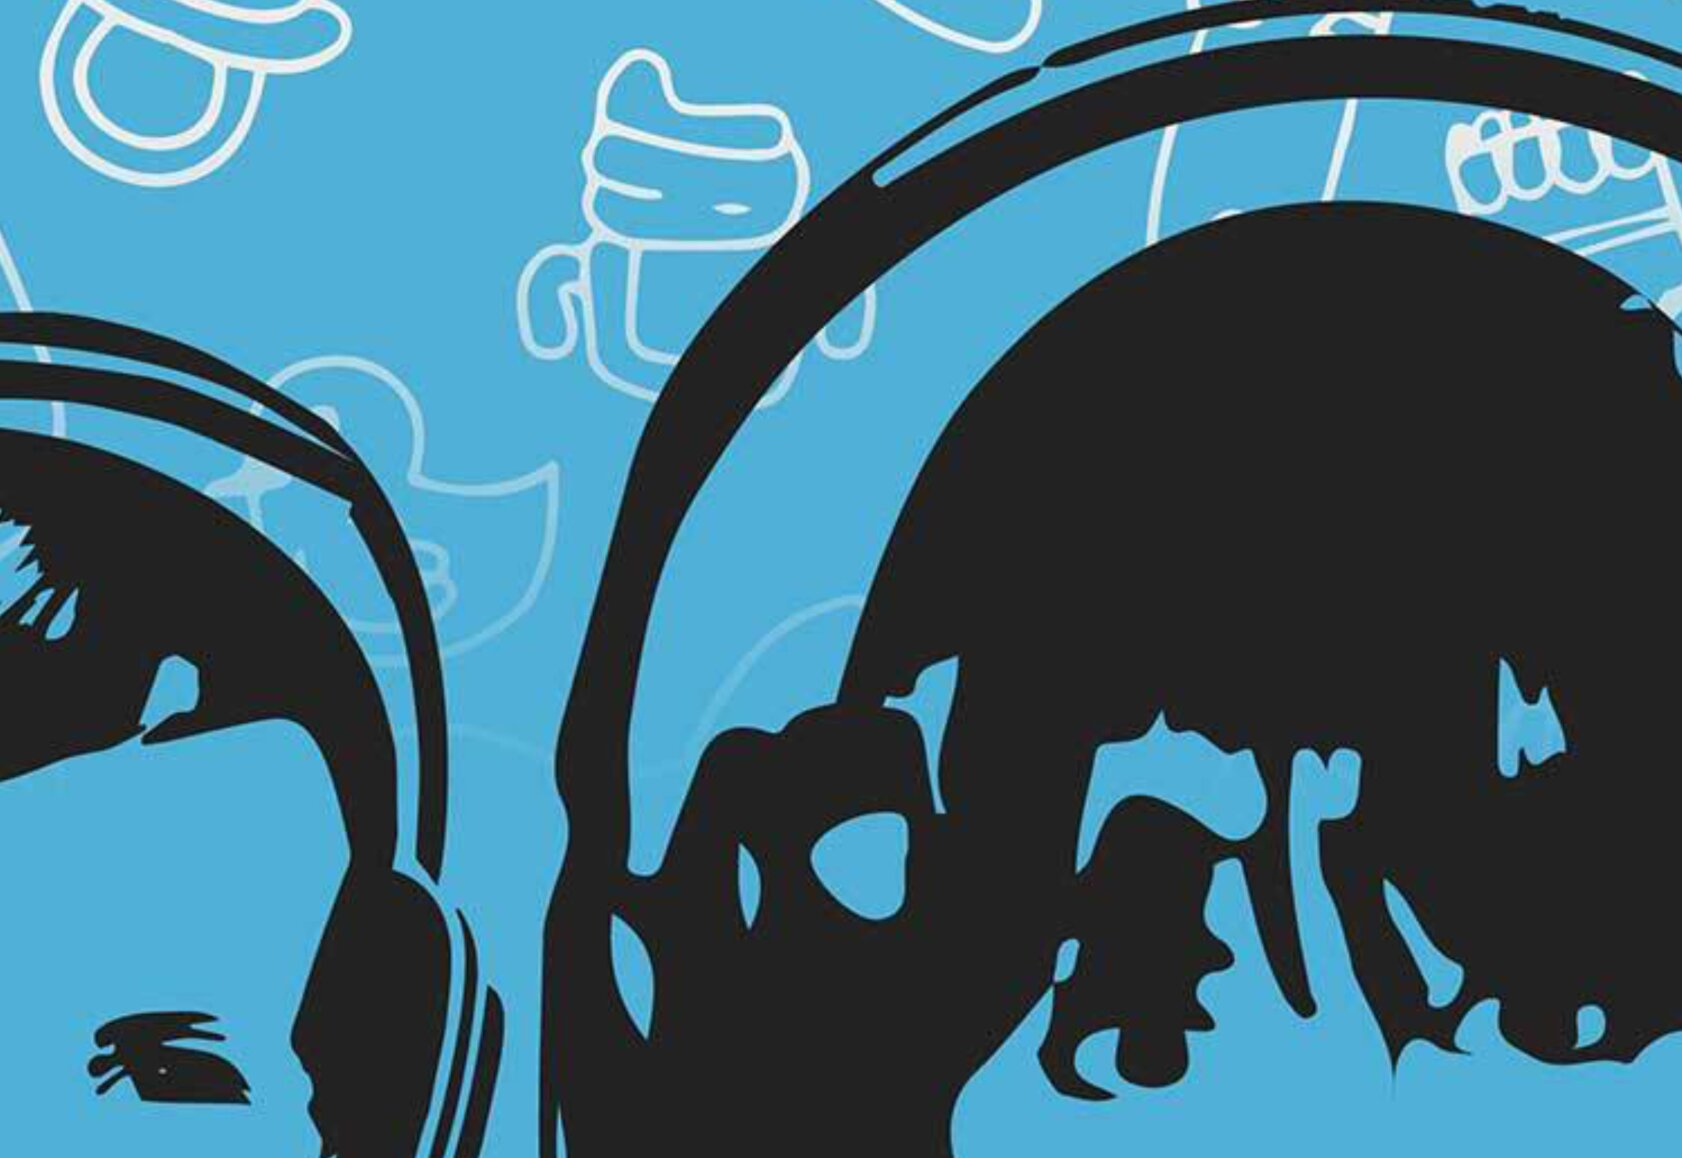 iCandy Duo Podcast - Dr Ben Weiner